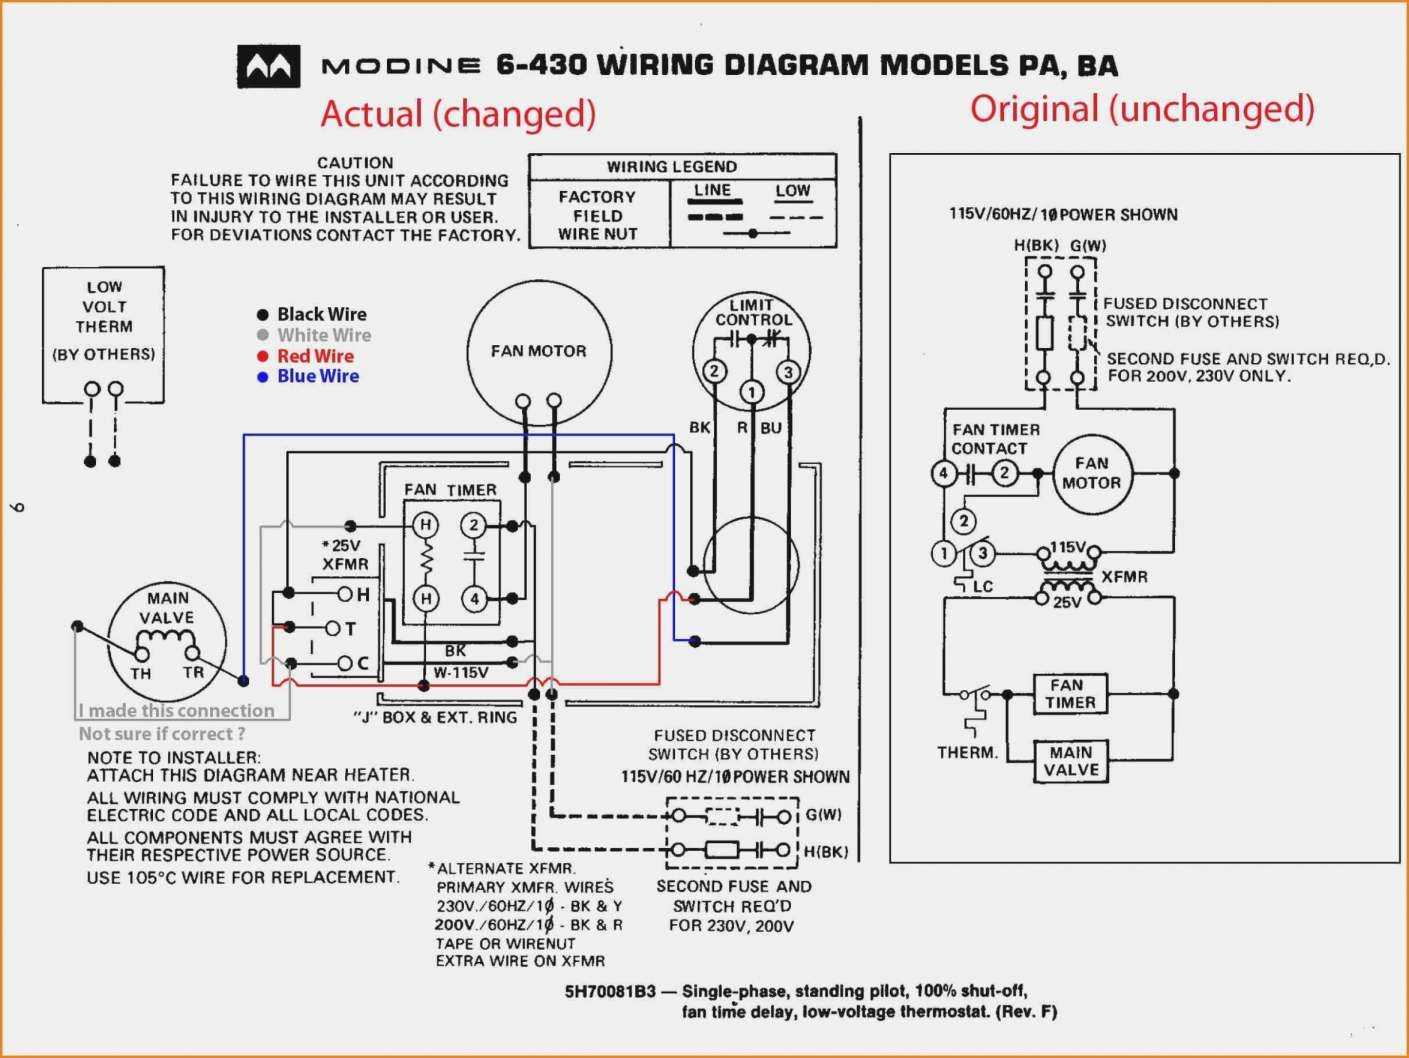 general electric wiring diagram 10 general electric motor 5kc wiring diagram wiring diagram in  10 general electric motor 5kc wiring